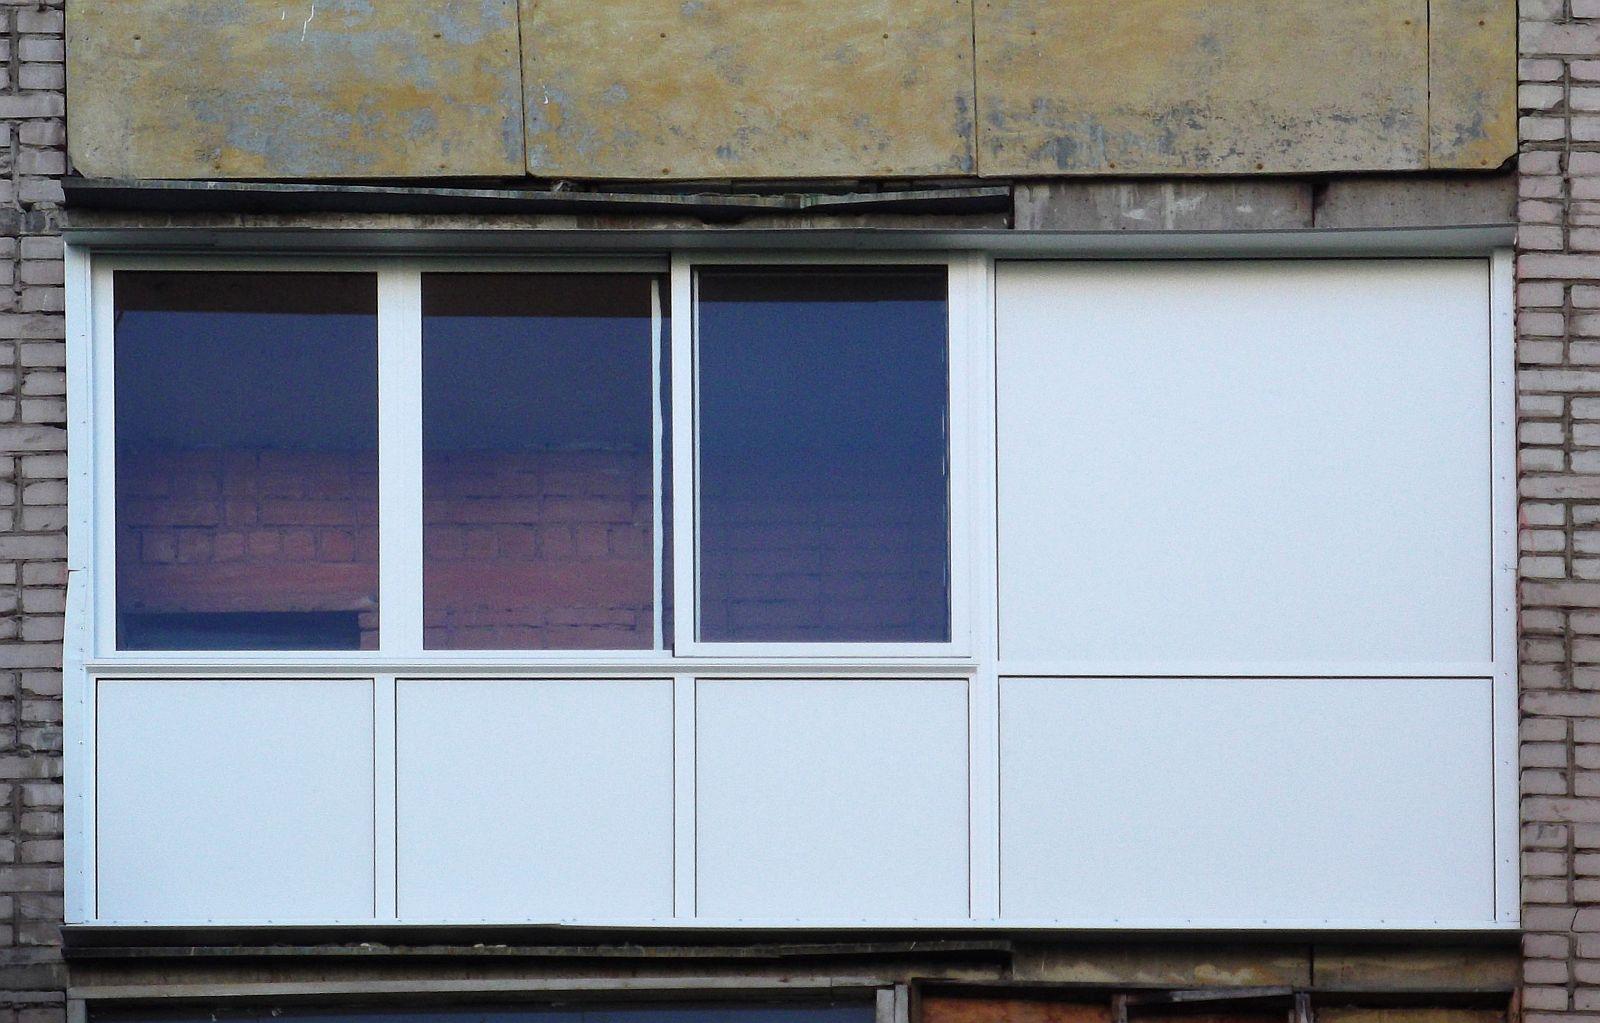 Балконы,лоджии,окна и двери.: 4 900 грн - бизнес и услуги / .